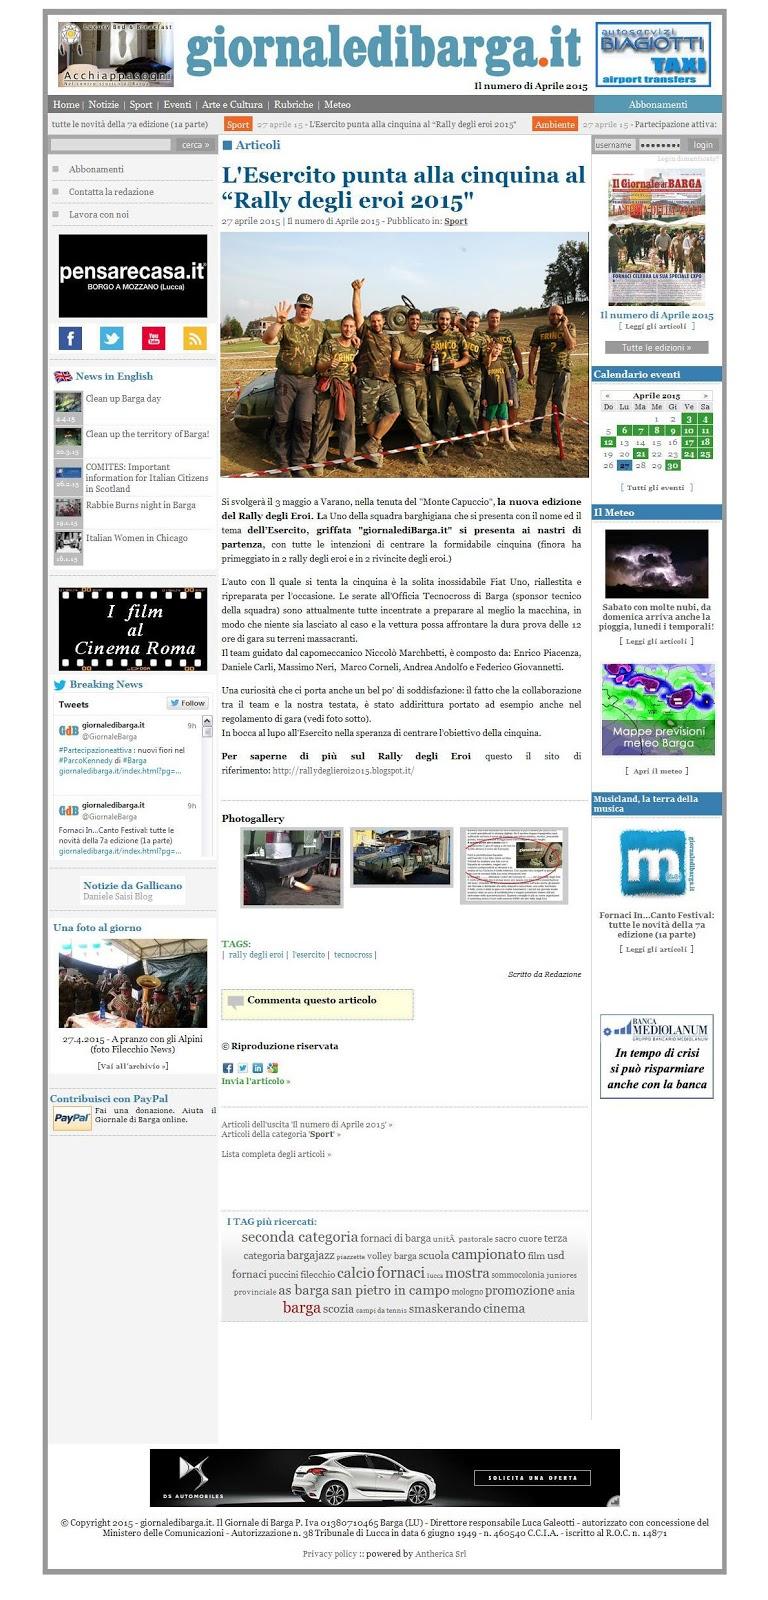 http://www.giornaledibarga.it/index.html?pg=8&id=11390